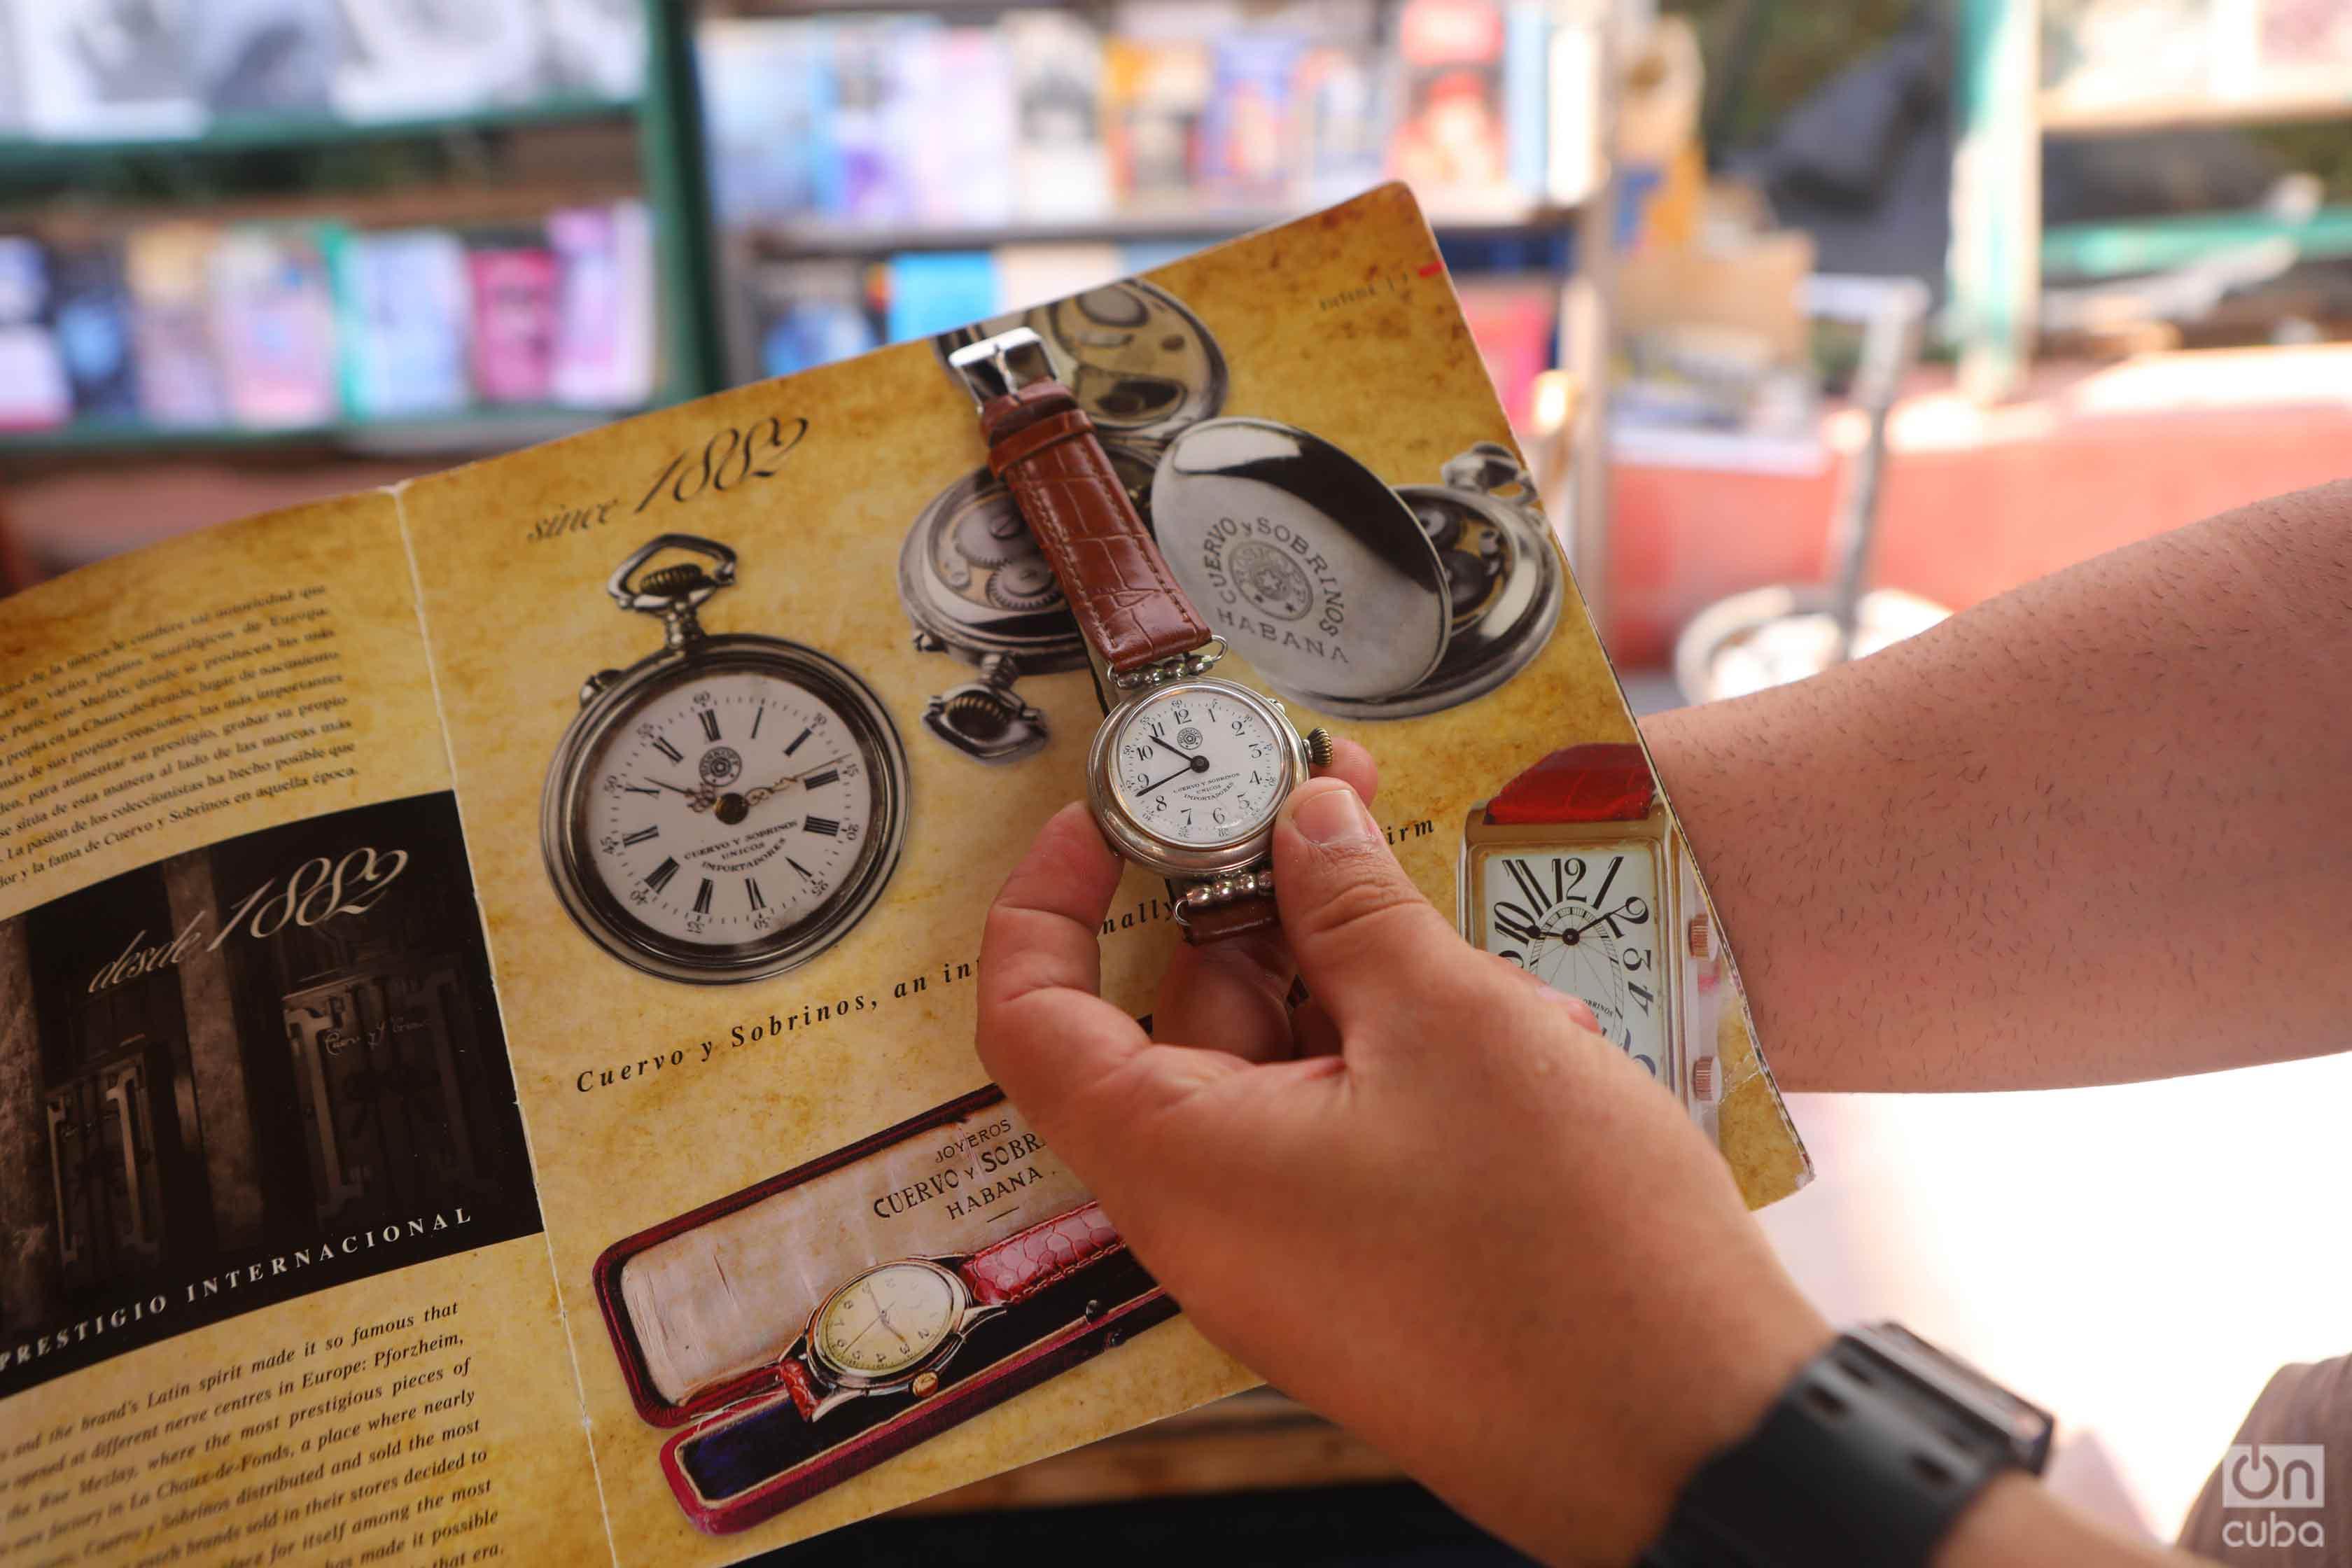 Cuervo y Sobrinos-branded Roskopf p0cket watch, Plaza de Antigüedades, Habana. Foto: Christopher P Baker.